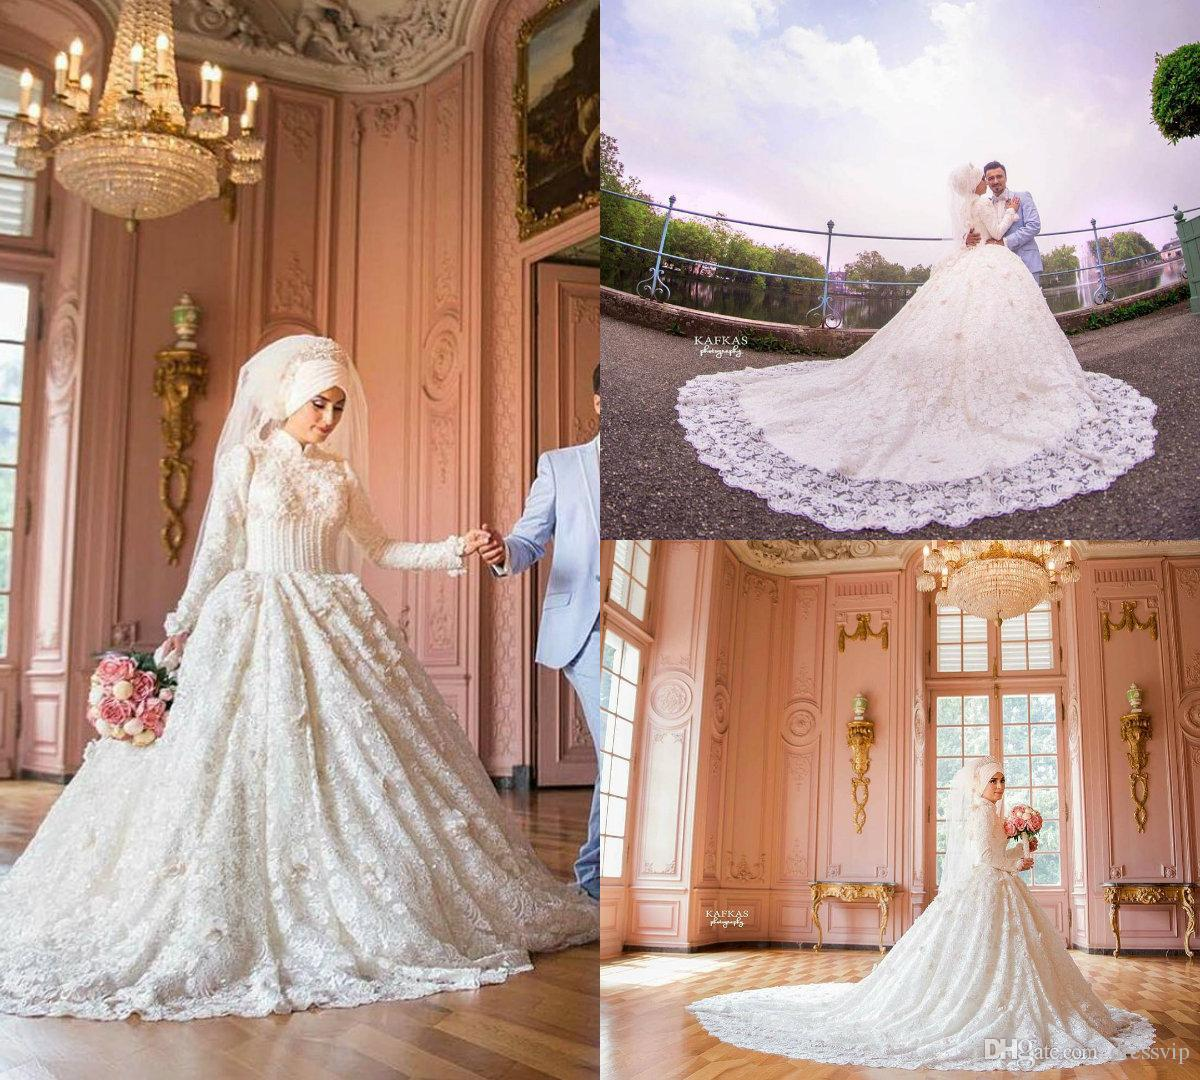 High Neck Long Sleeves Arabic Hijab Muslim Wedding Dresses Custom Made 2018  Romantic Lace Appliqued Beading Country Bridal Gowns Vestido De Wedding  Dress ... 2ccf1c58ba2c